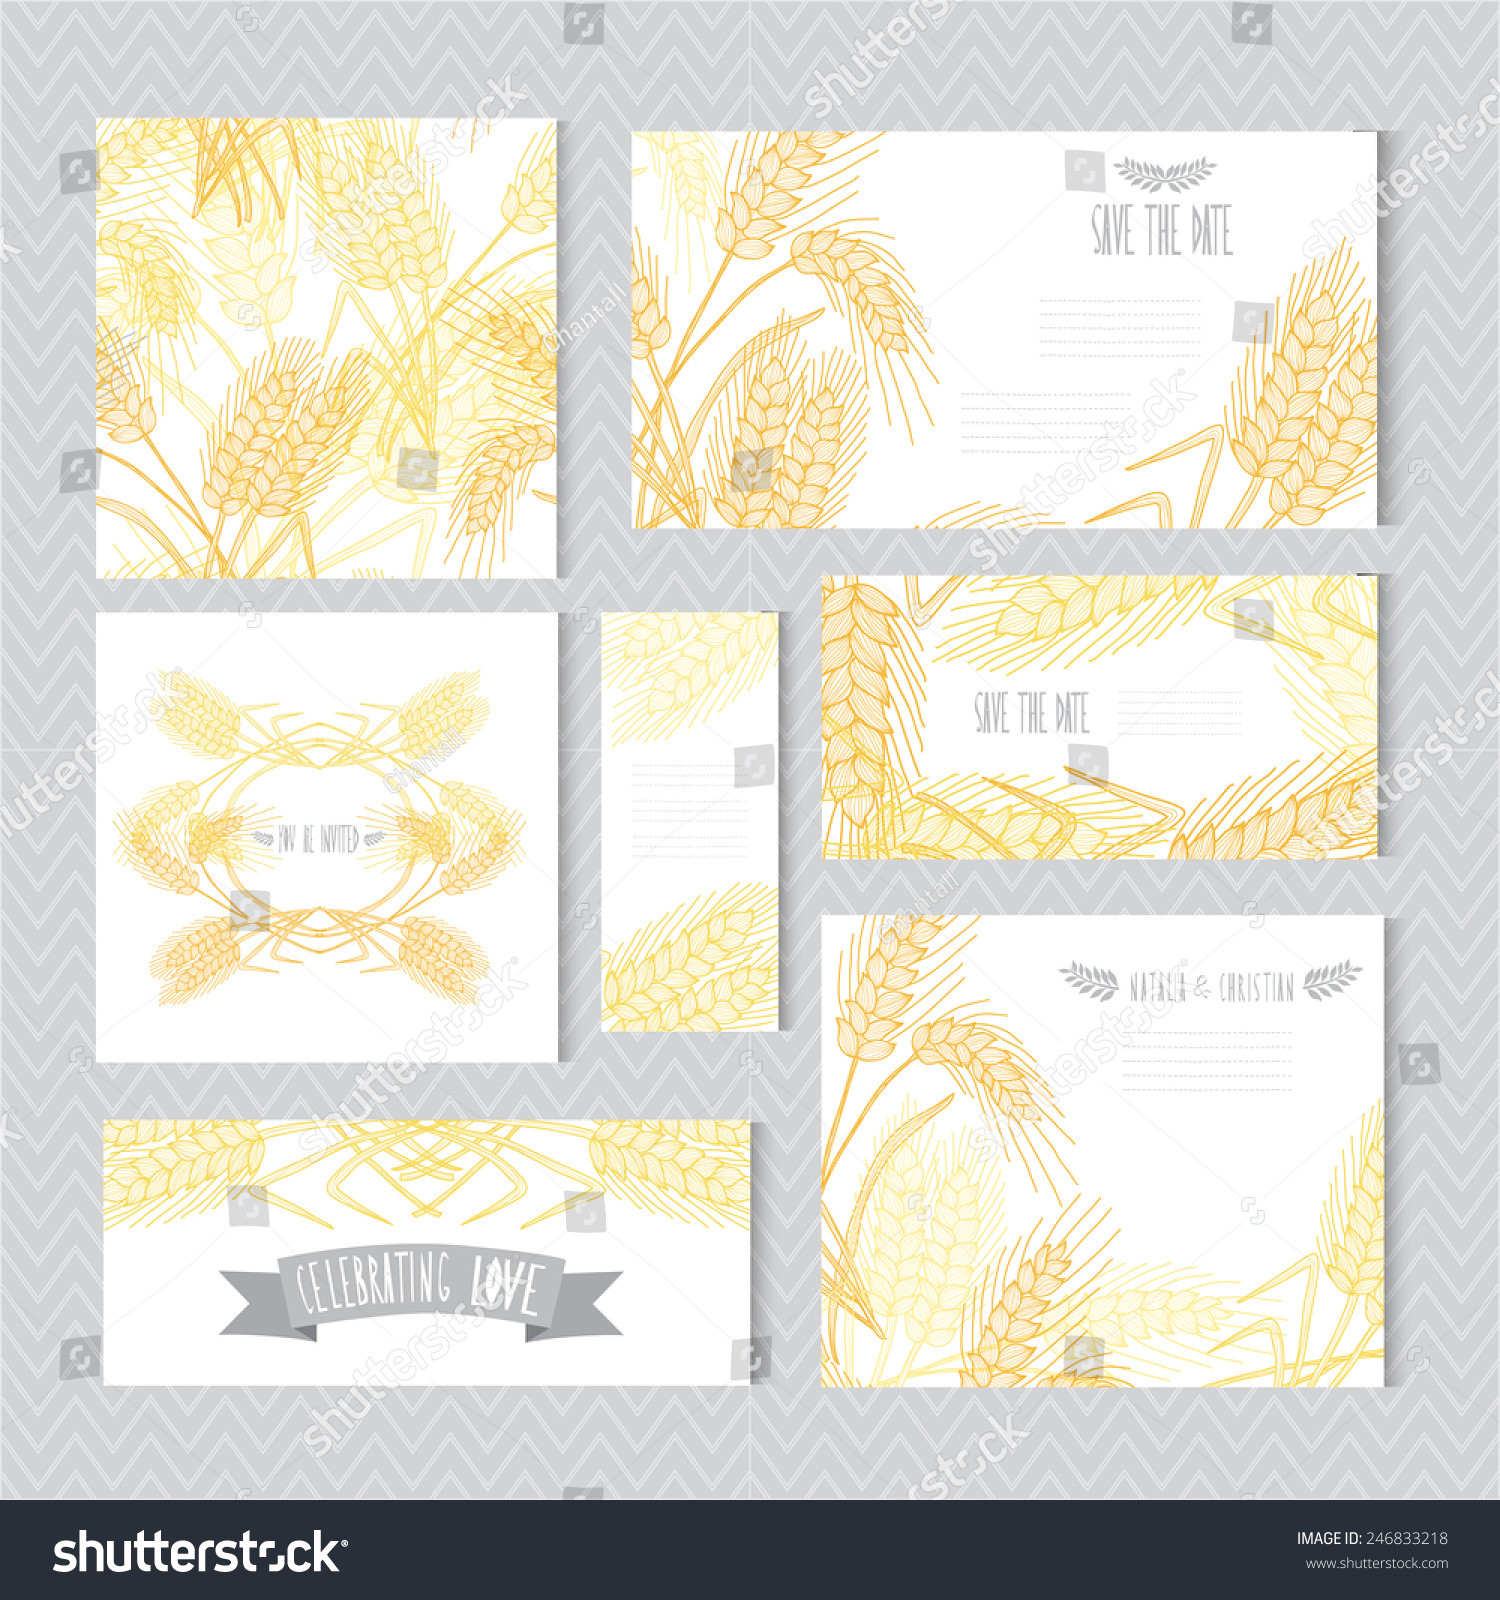 Elegant Cards Decorative Wheat Design Elements Stock Vector ...